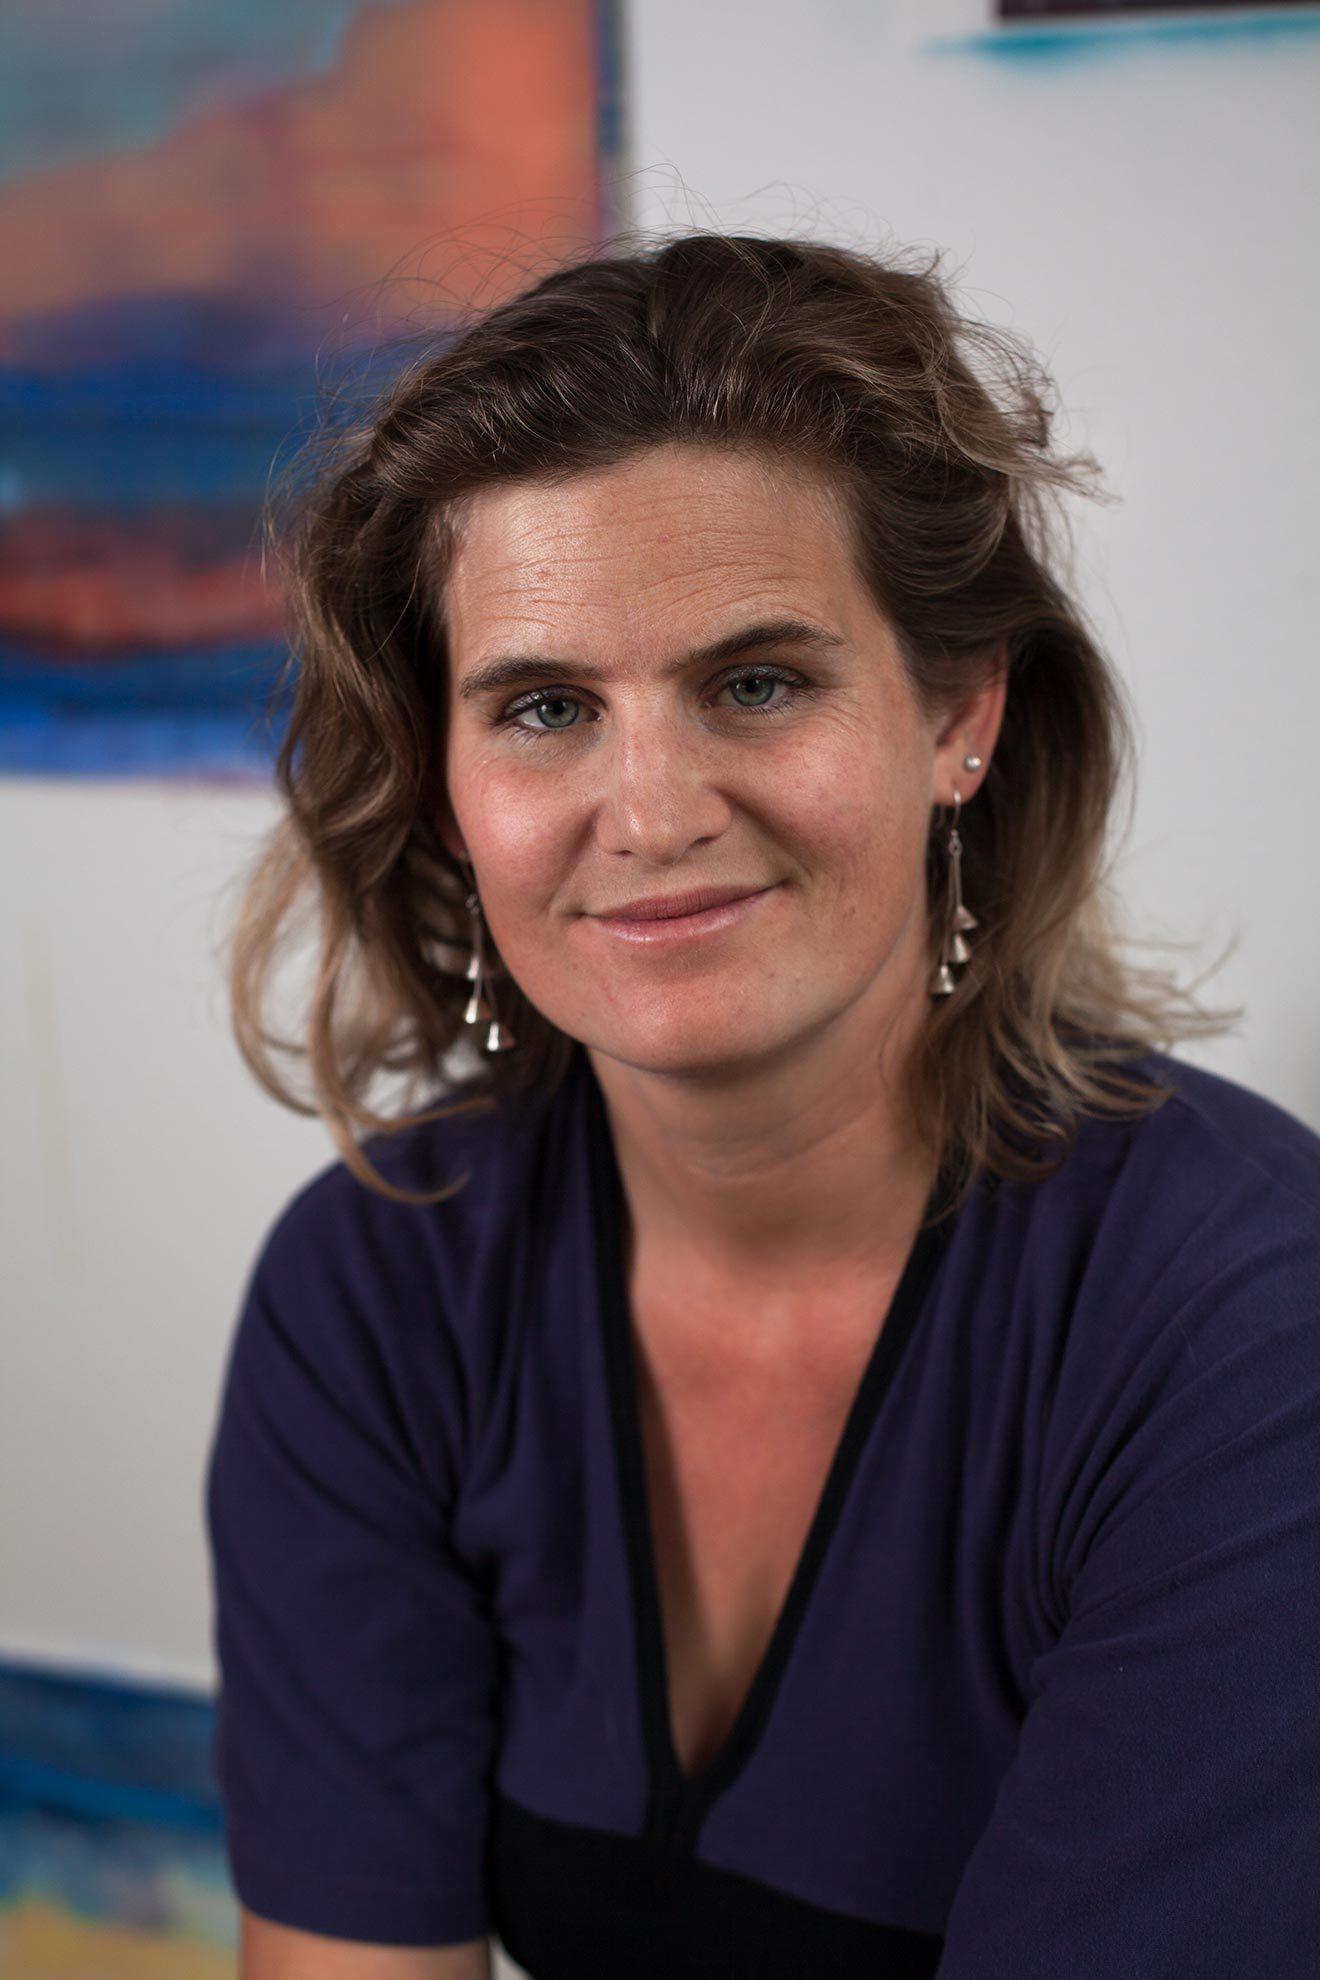 Anna Eibl-Eibesfeld, Kunstwerk des Monats, Berg, Februar 2019